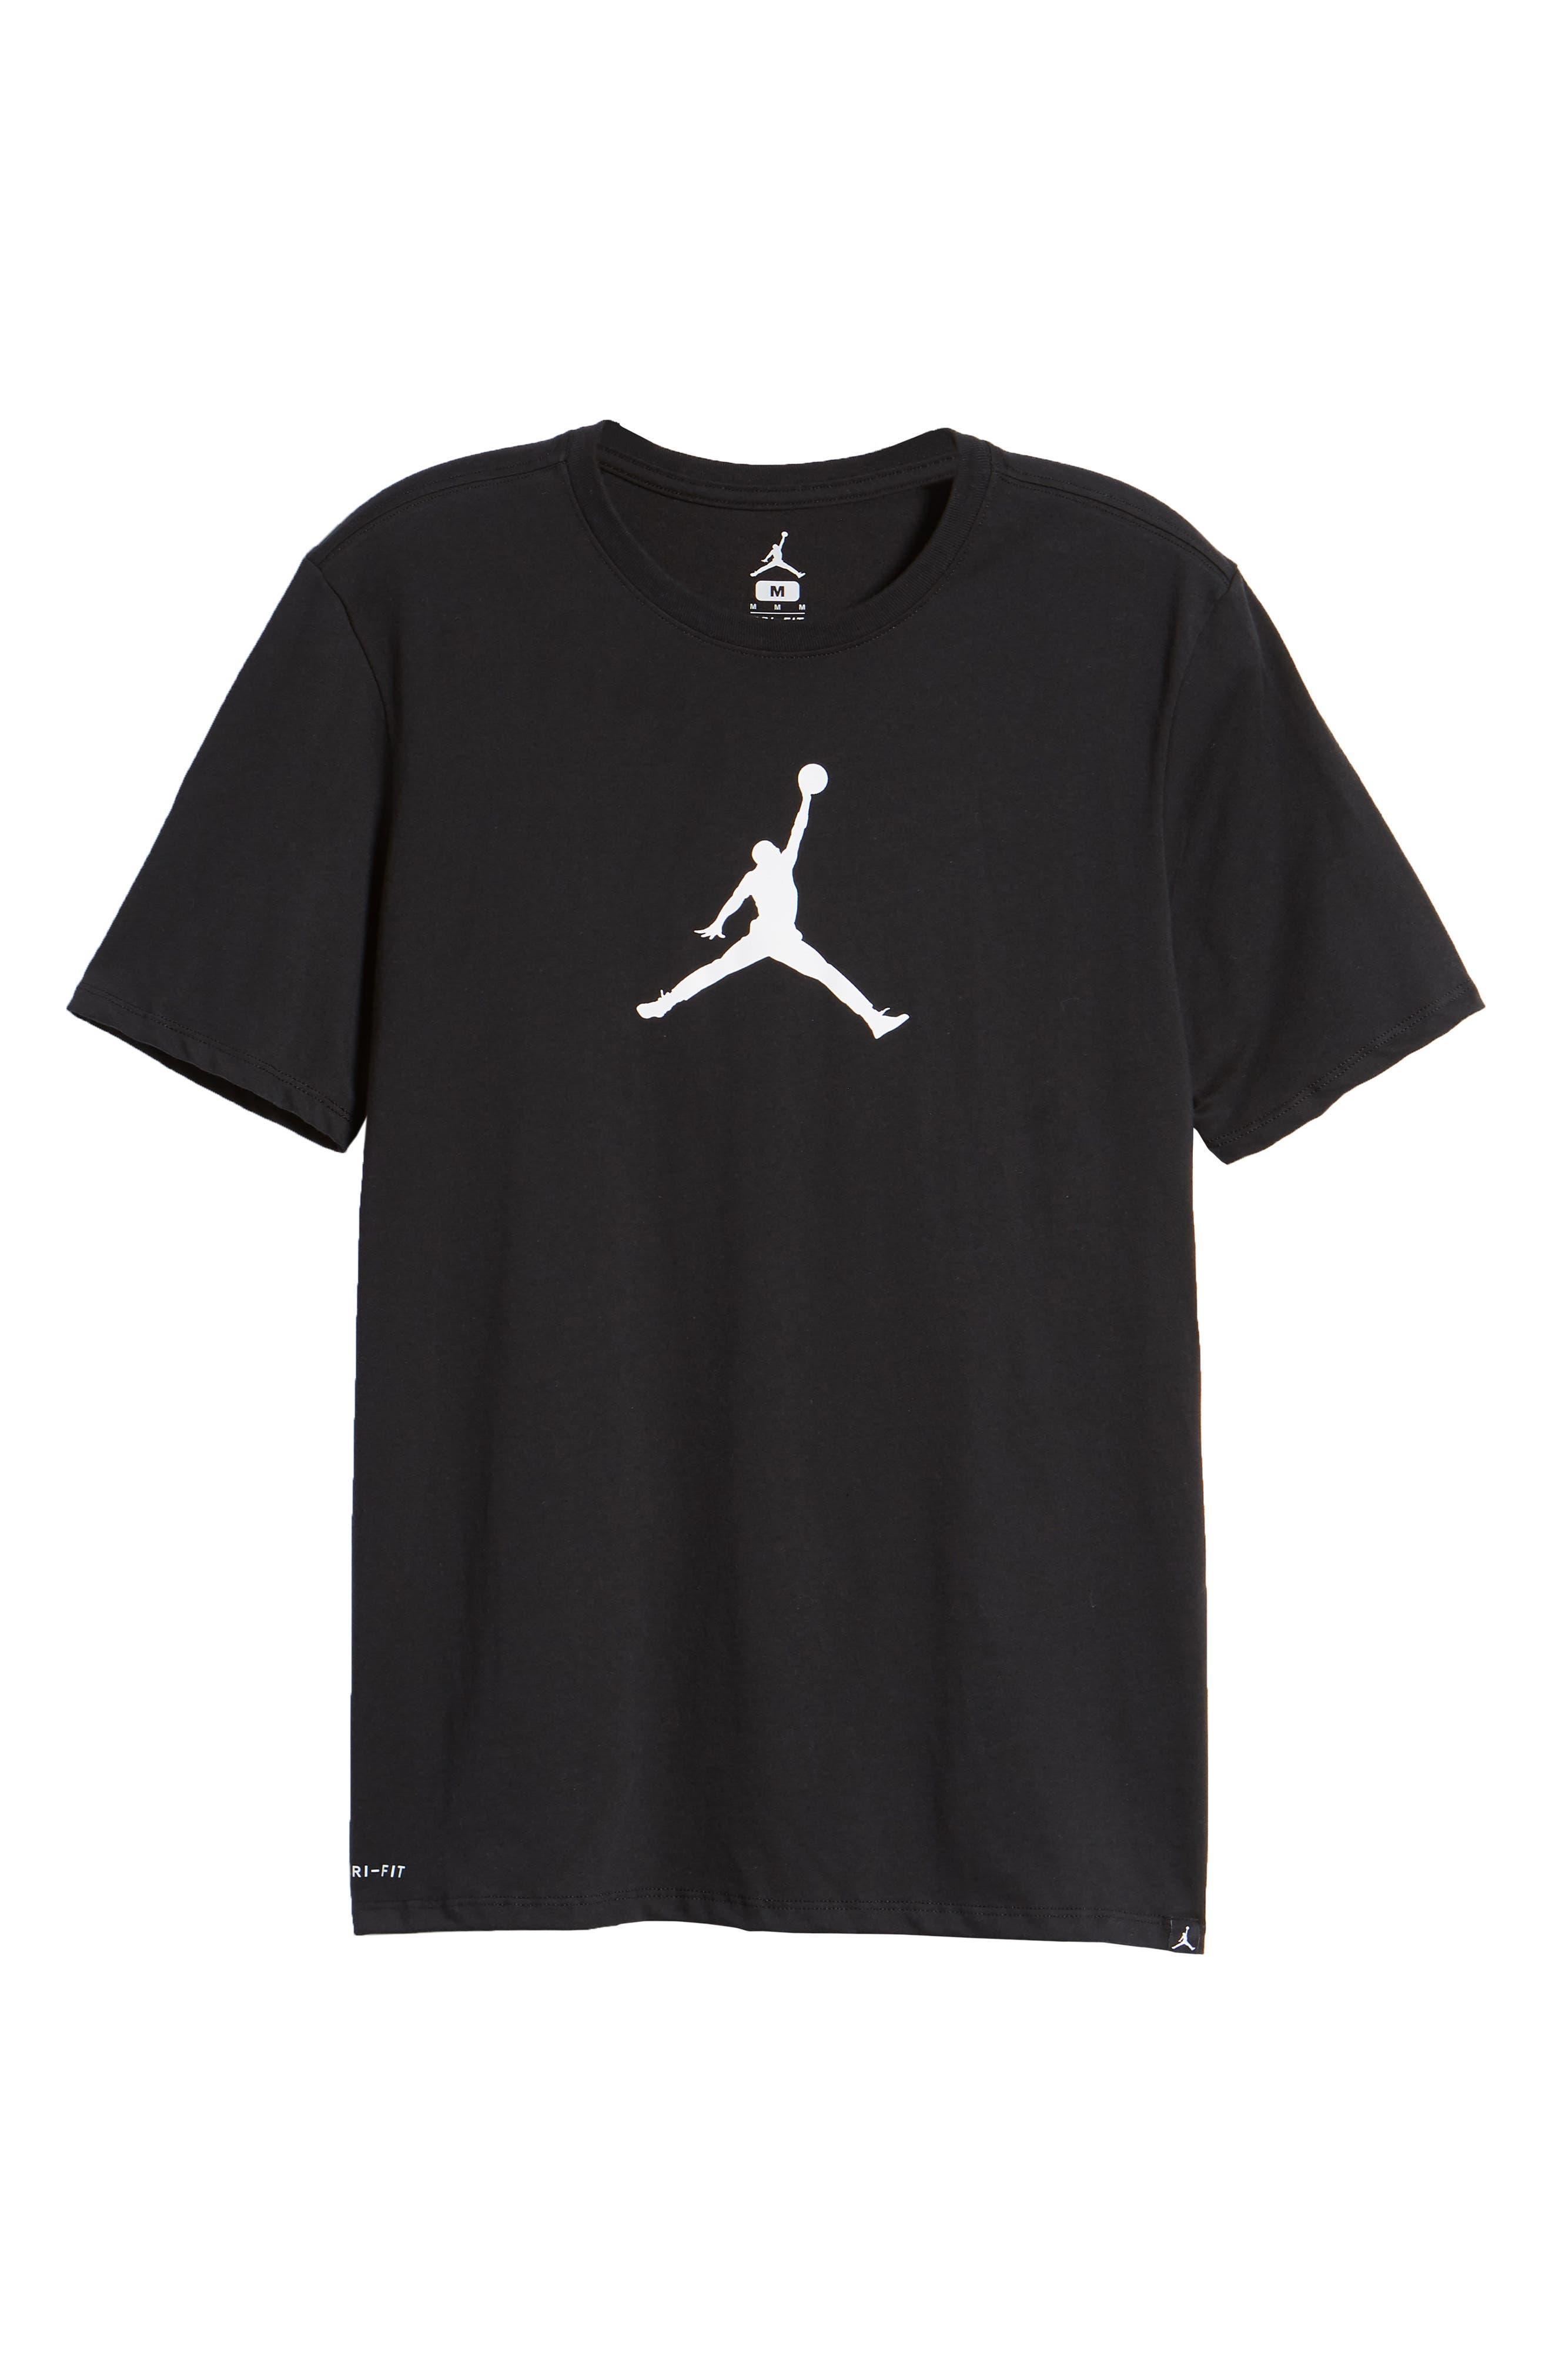 Iconic Jumpman Graphic T-Shirt,                             Alternate thumbnail 6, color,                             Black/ White